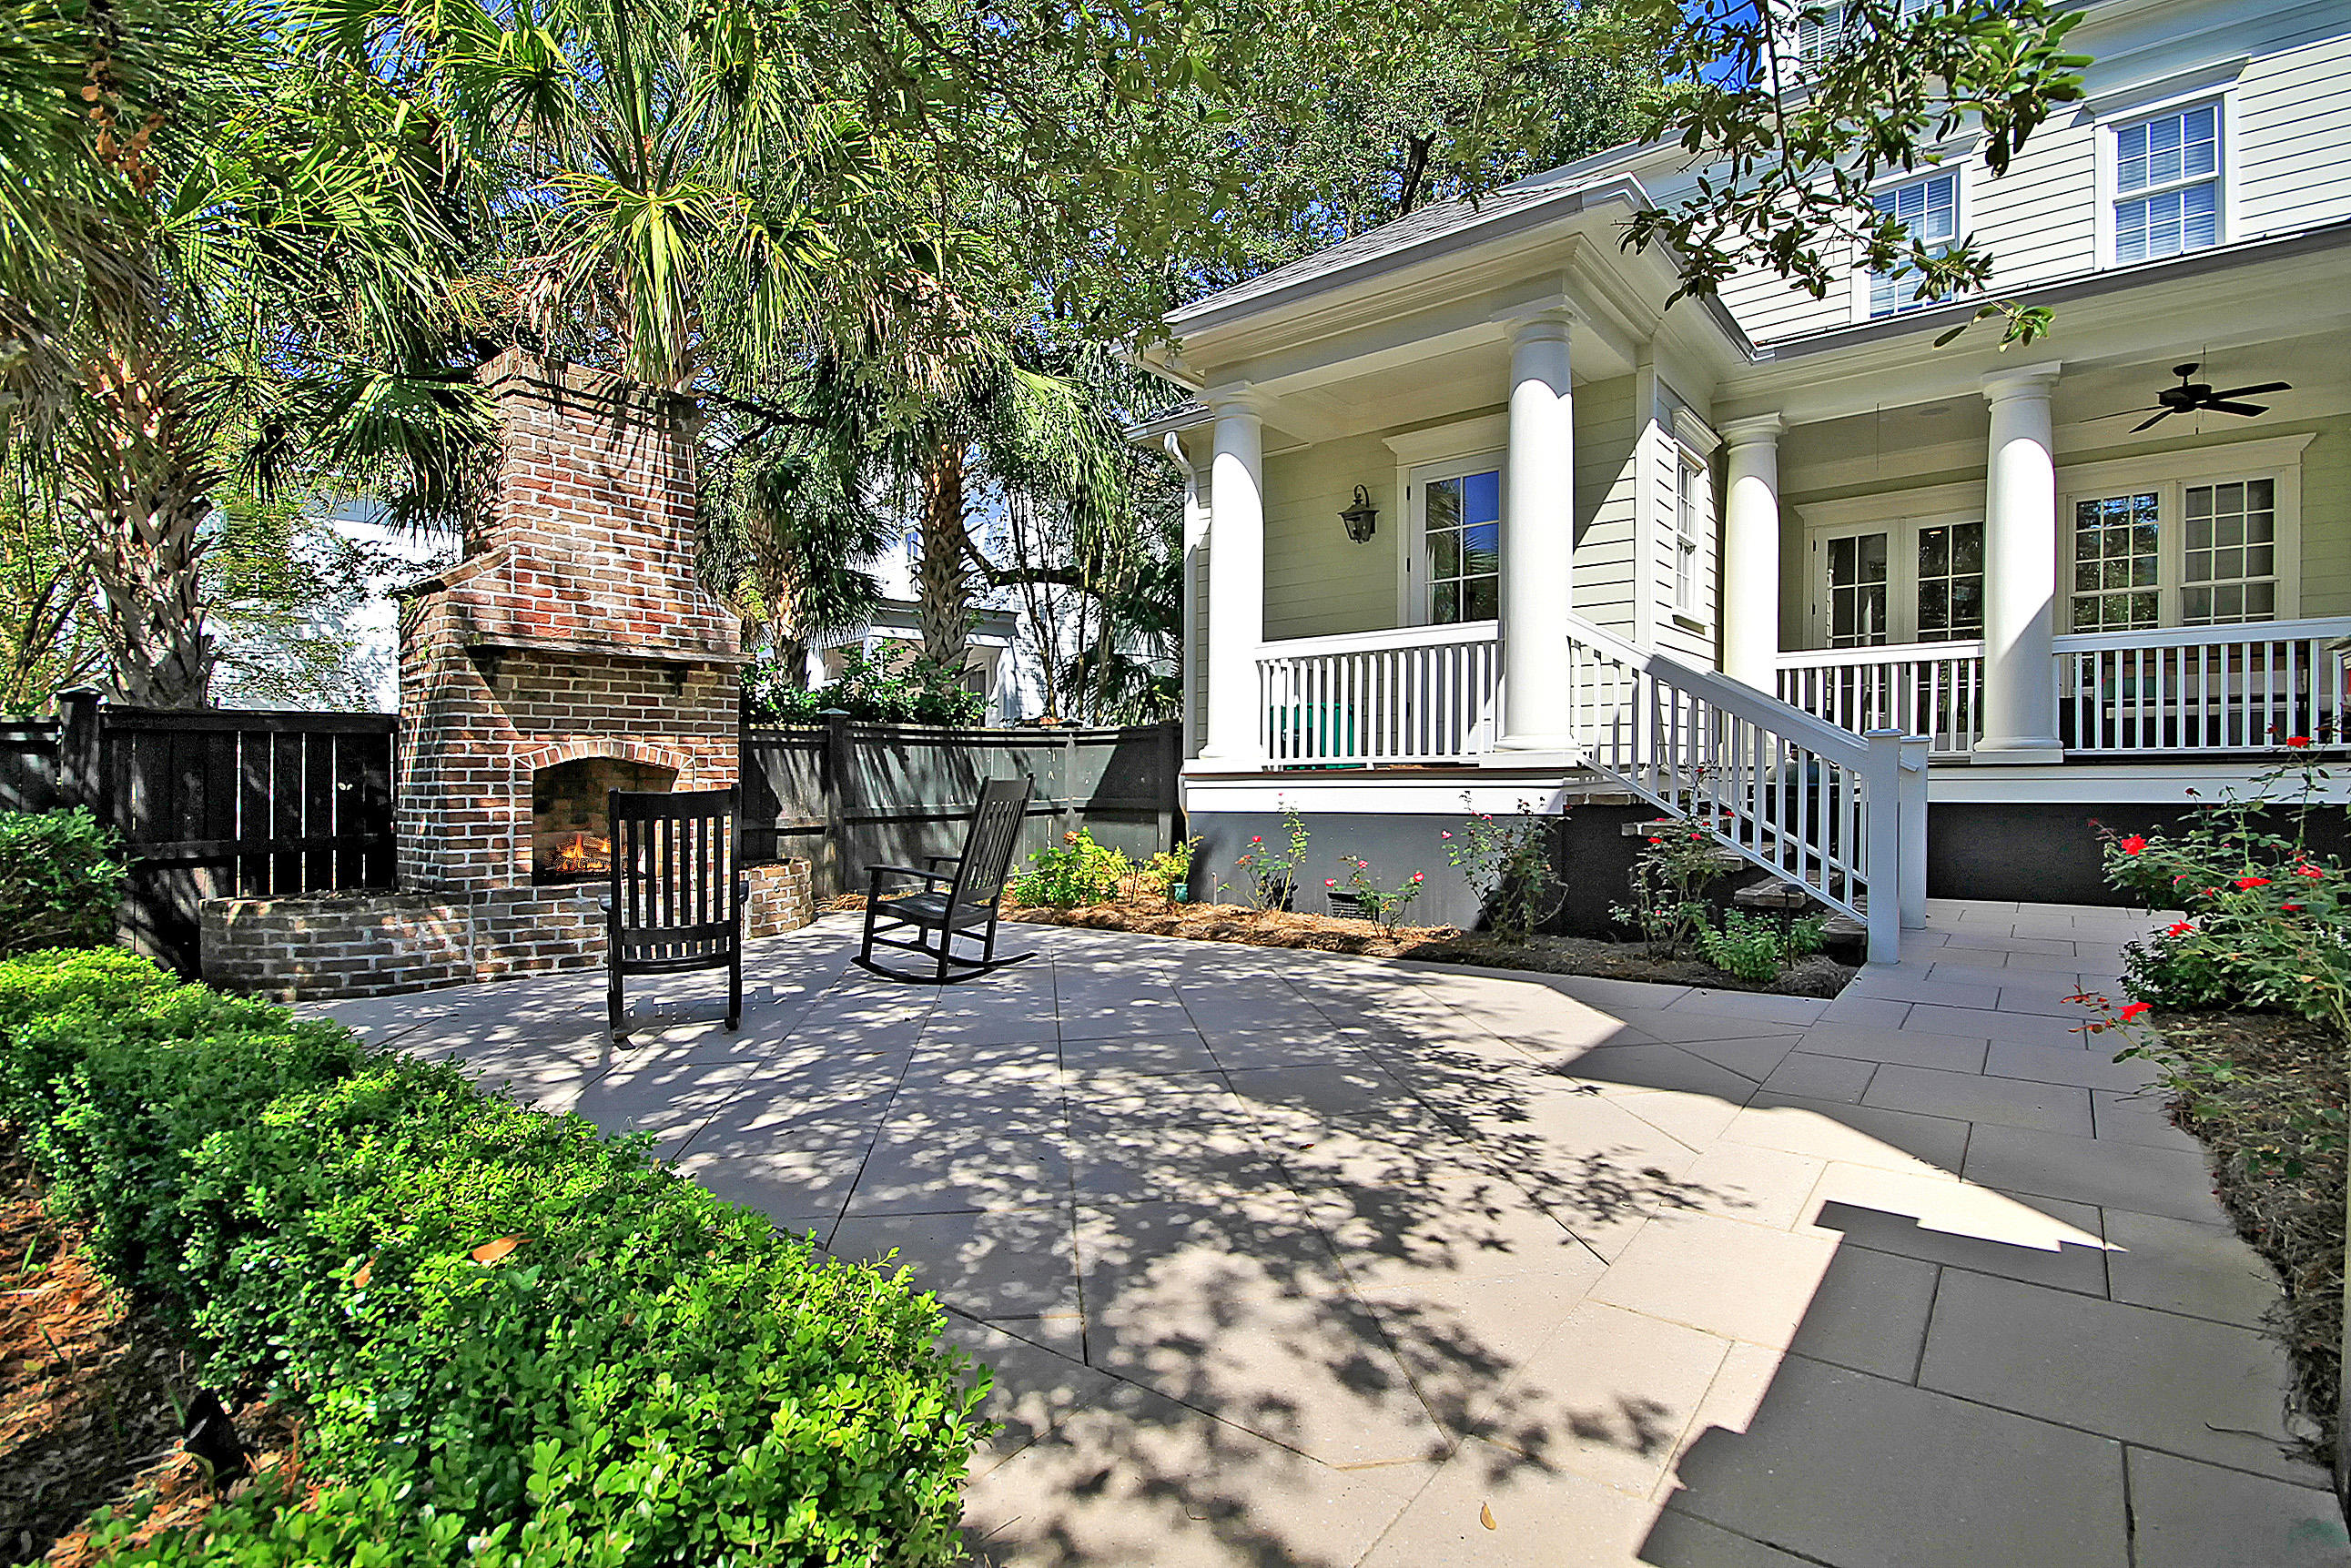 Daniel Island Homes For Sale - 263 Delahow, Daniel Island, SC - 0